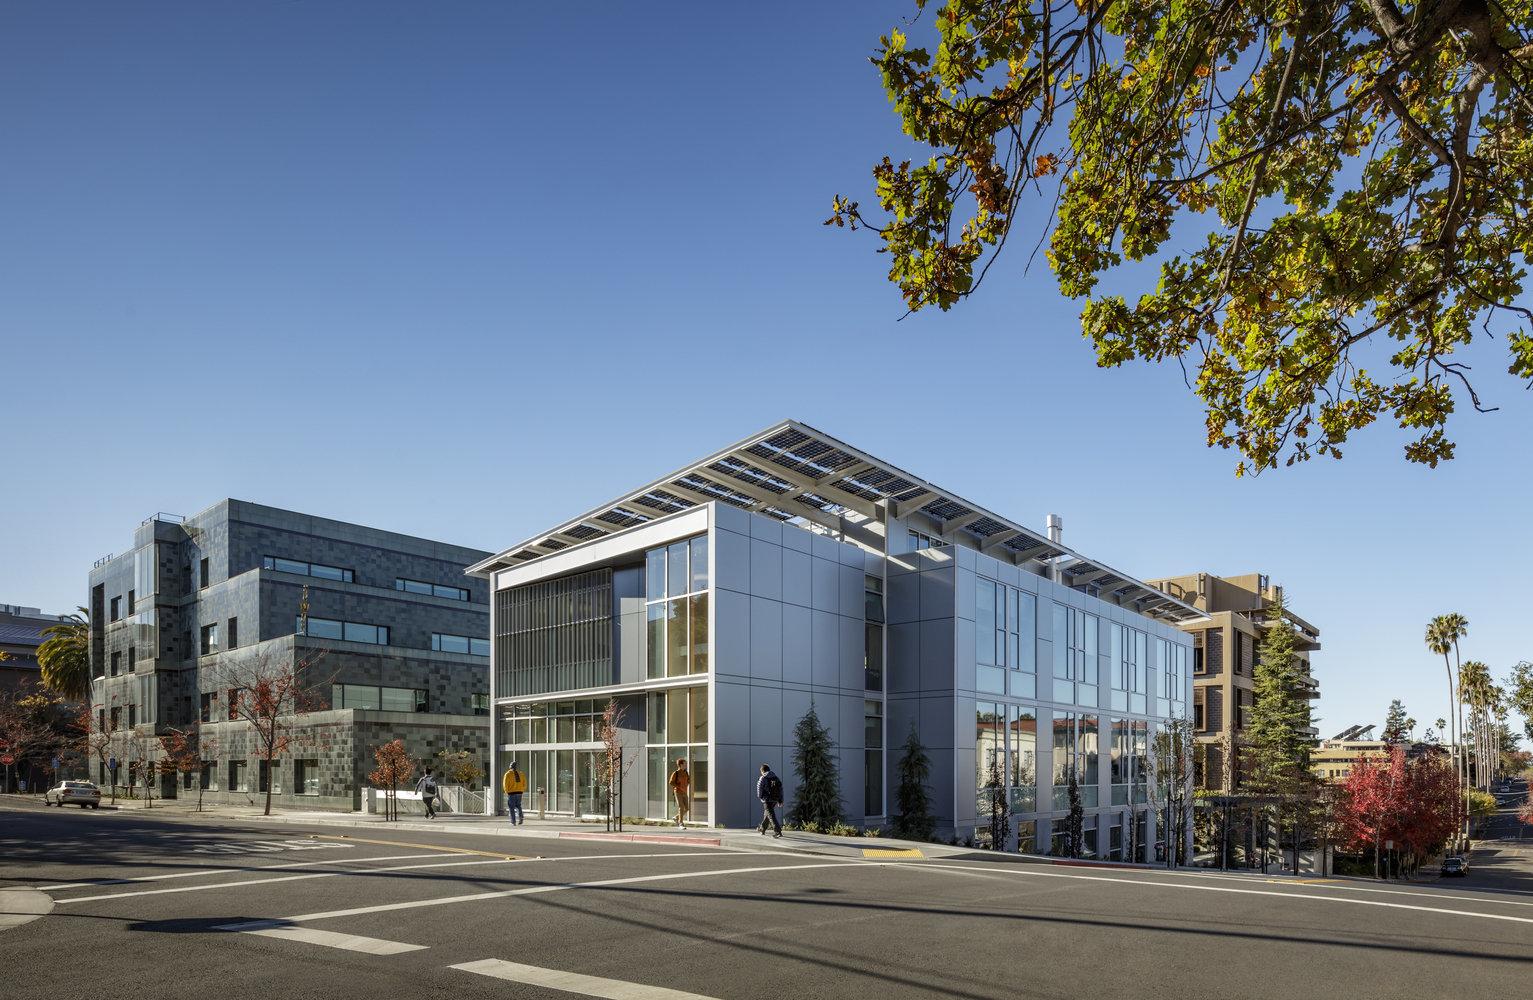 5. Jacobs Institute For Design Innovation (Berkeley, Calif.)